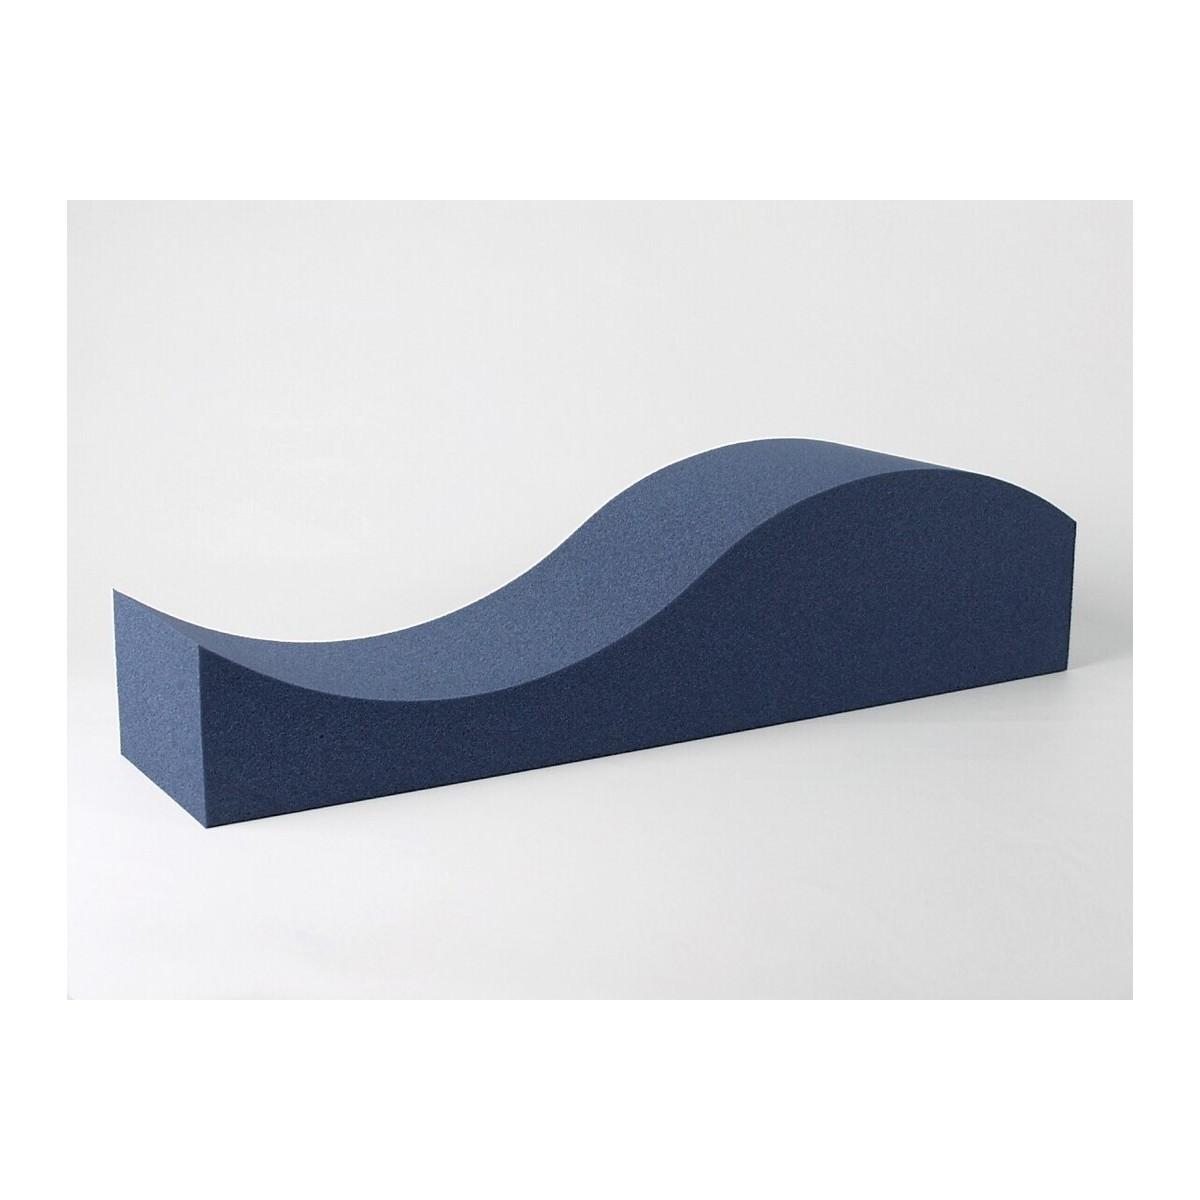 EliAcoustic surf pure dark blue